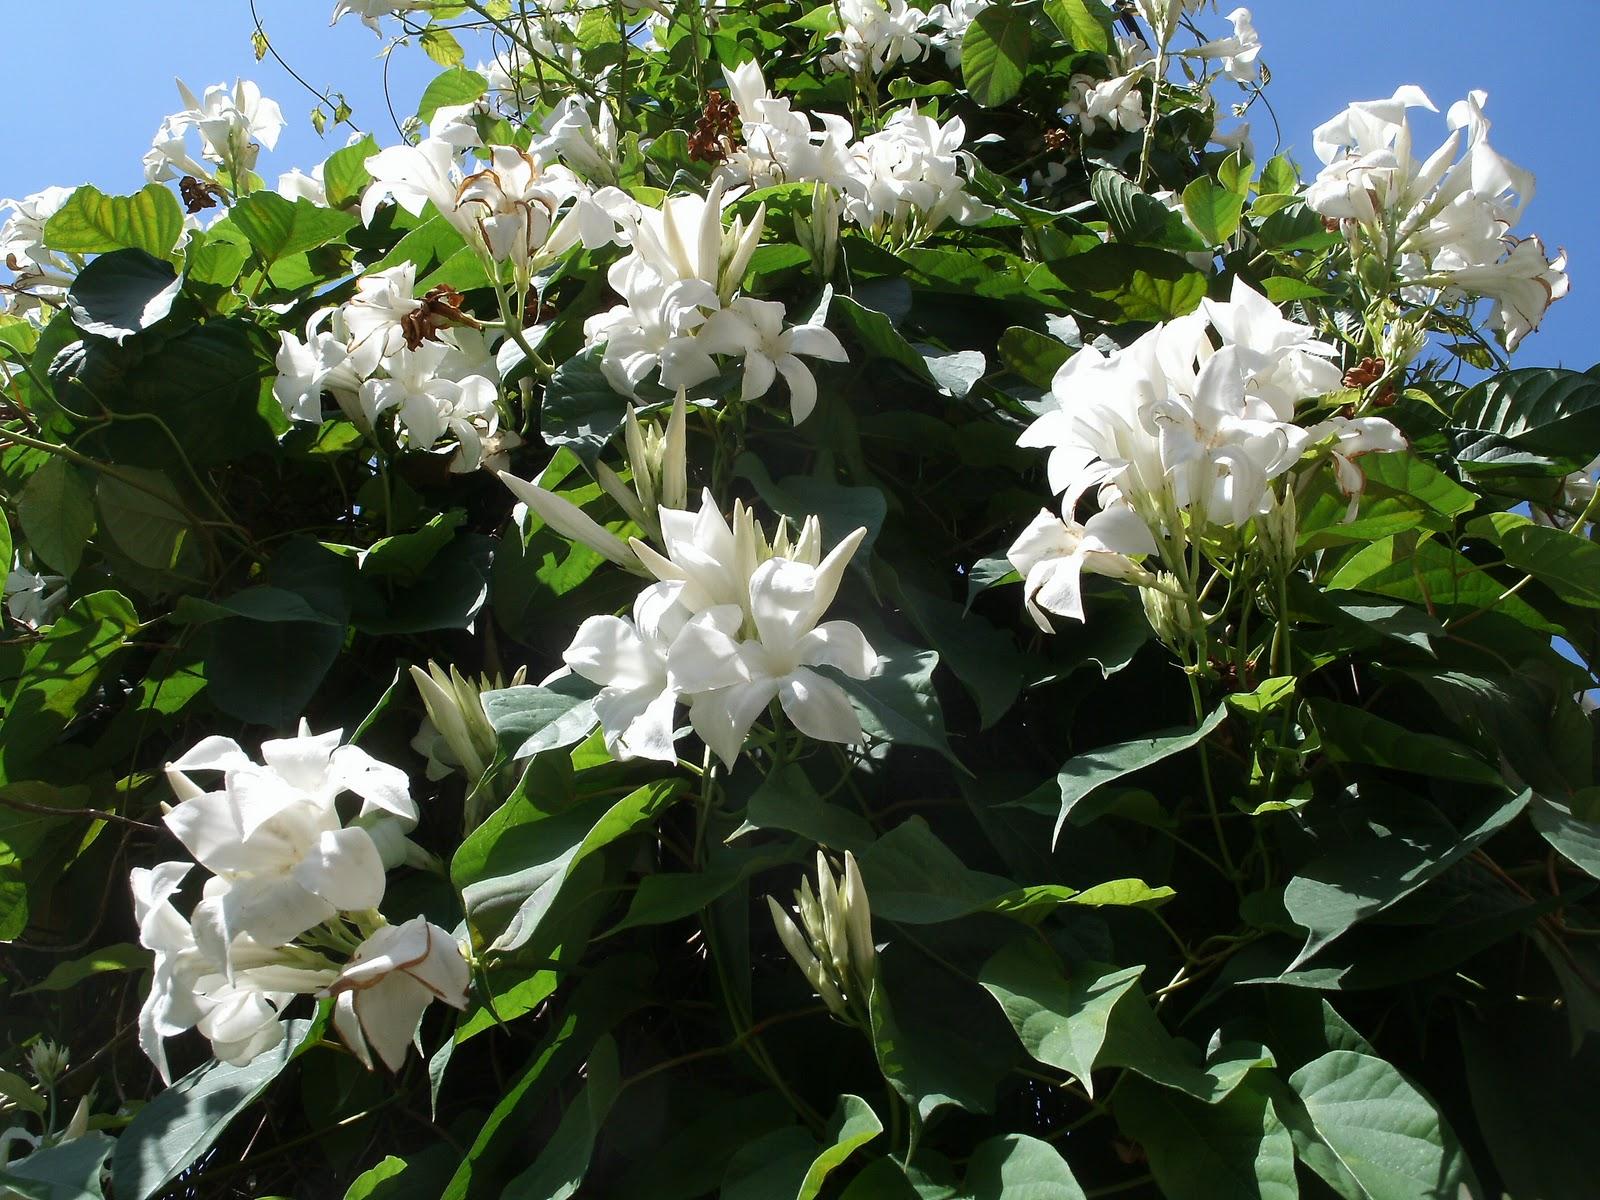 6 graines jasmin du chili dipladenia suaveolens g14 chilean jasmine seeds samen ebay. Black Bedroom Furniture Sets. Home Design Ideas